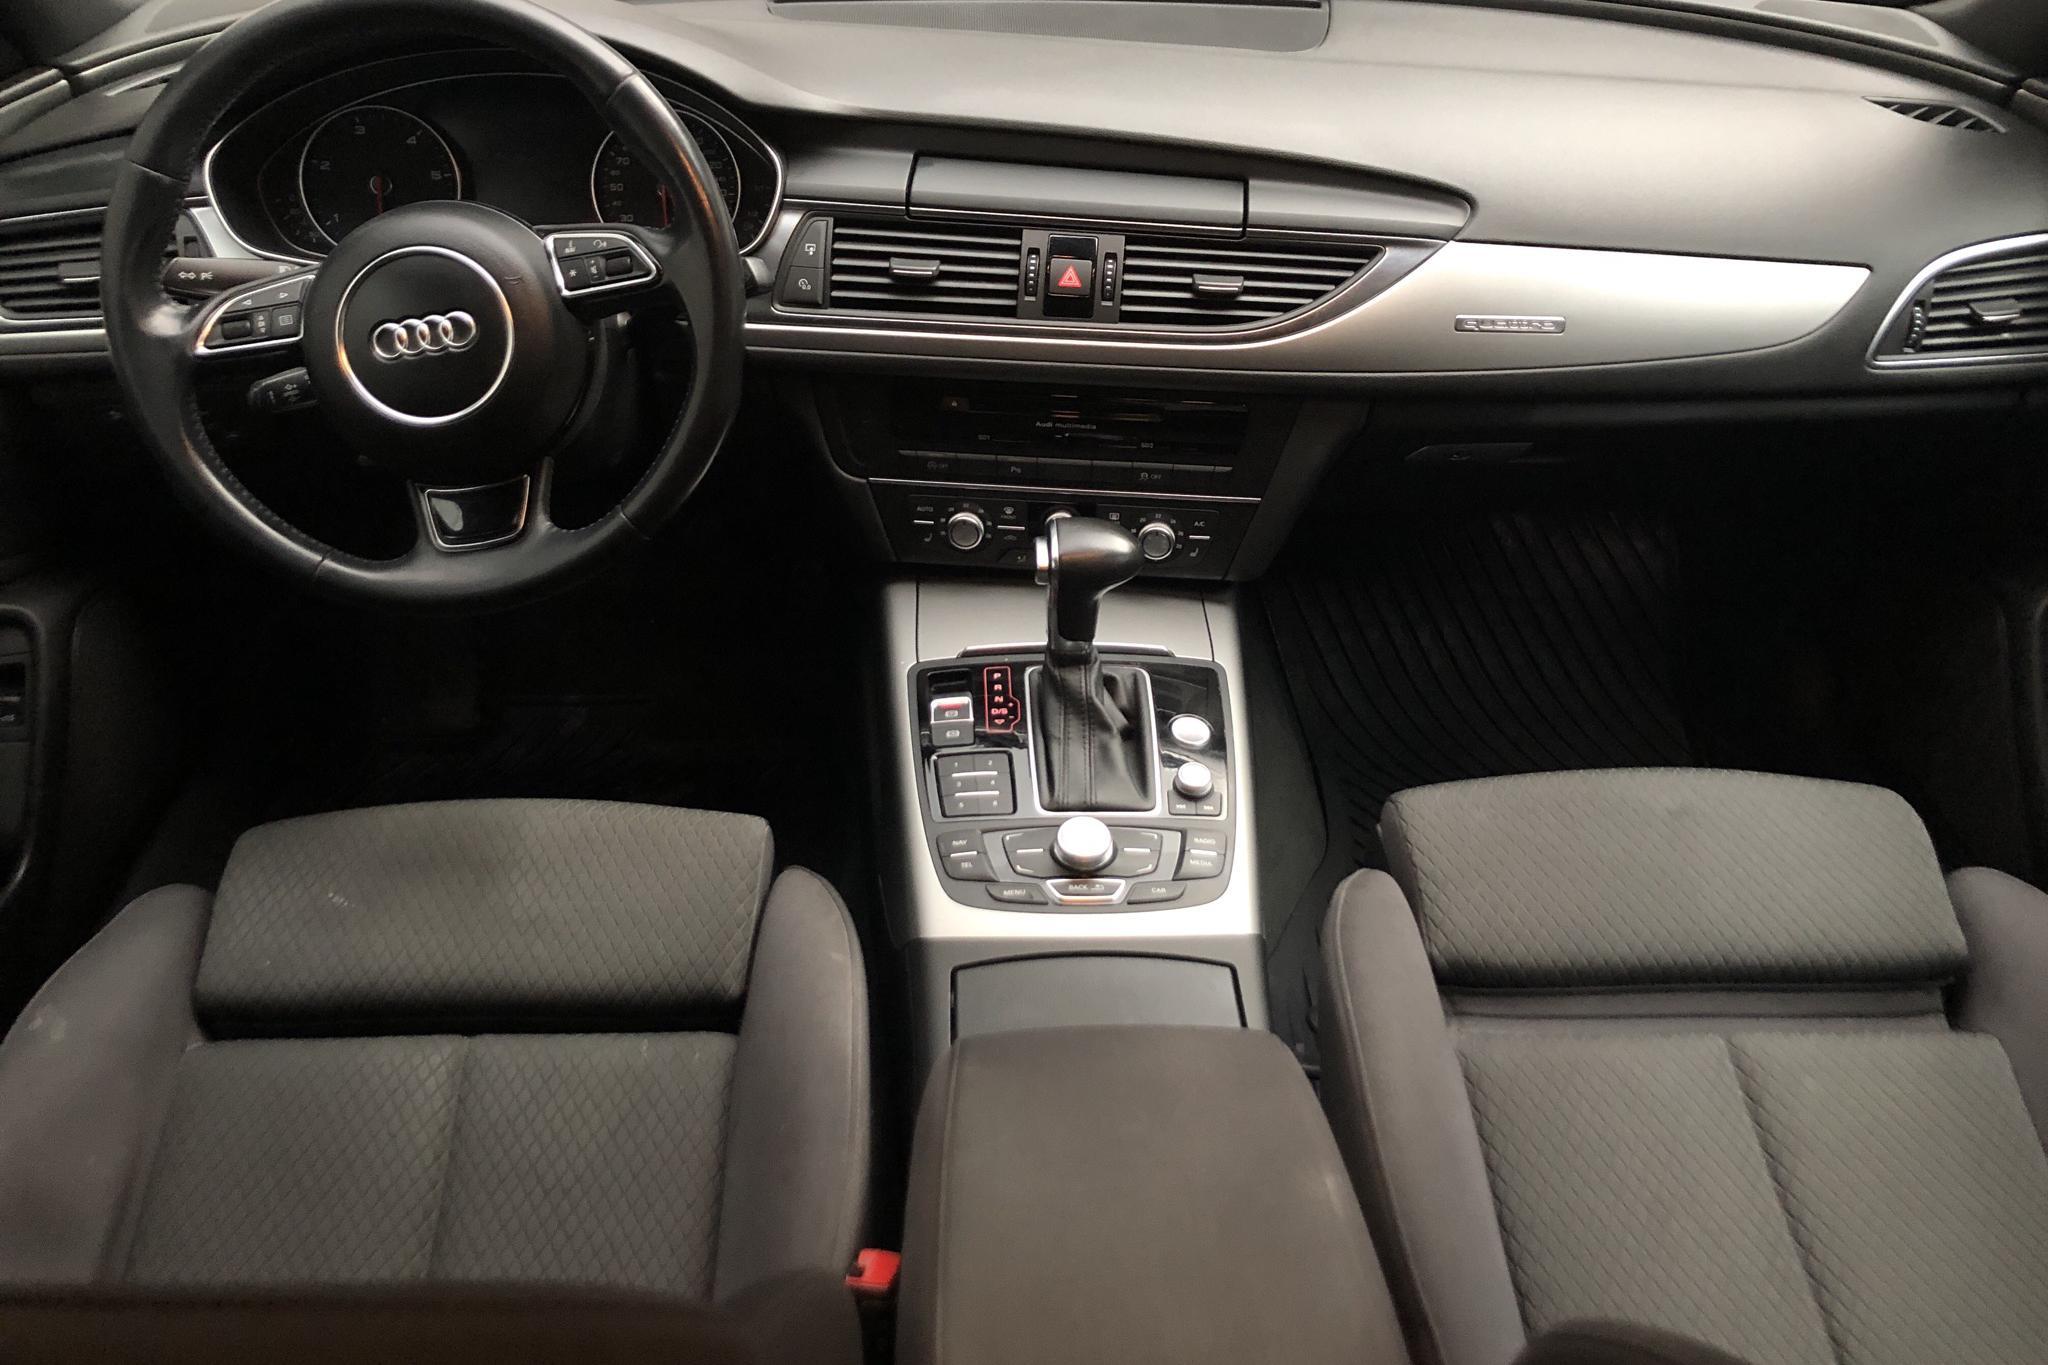 Audi A6 3.0 TDI quattro (204hk) - 224 190 km - Automatic - black - 2014